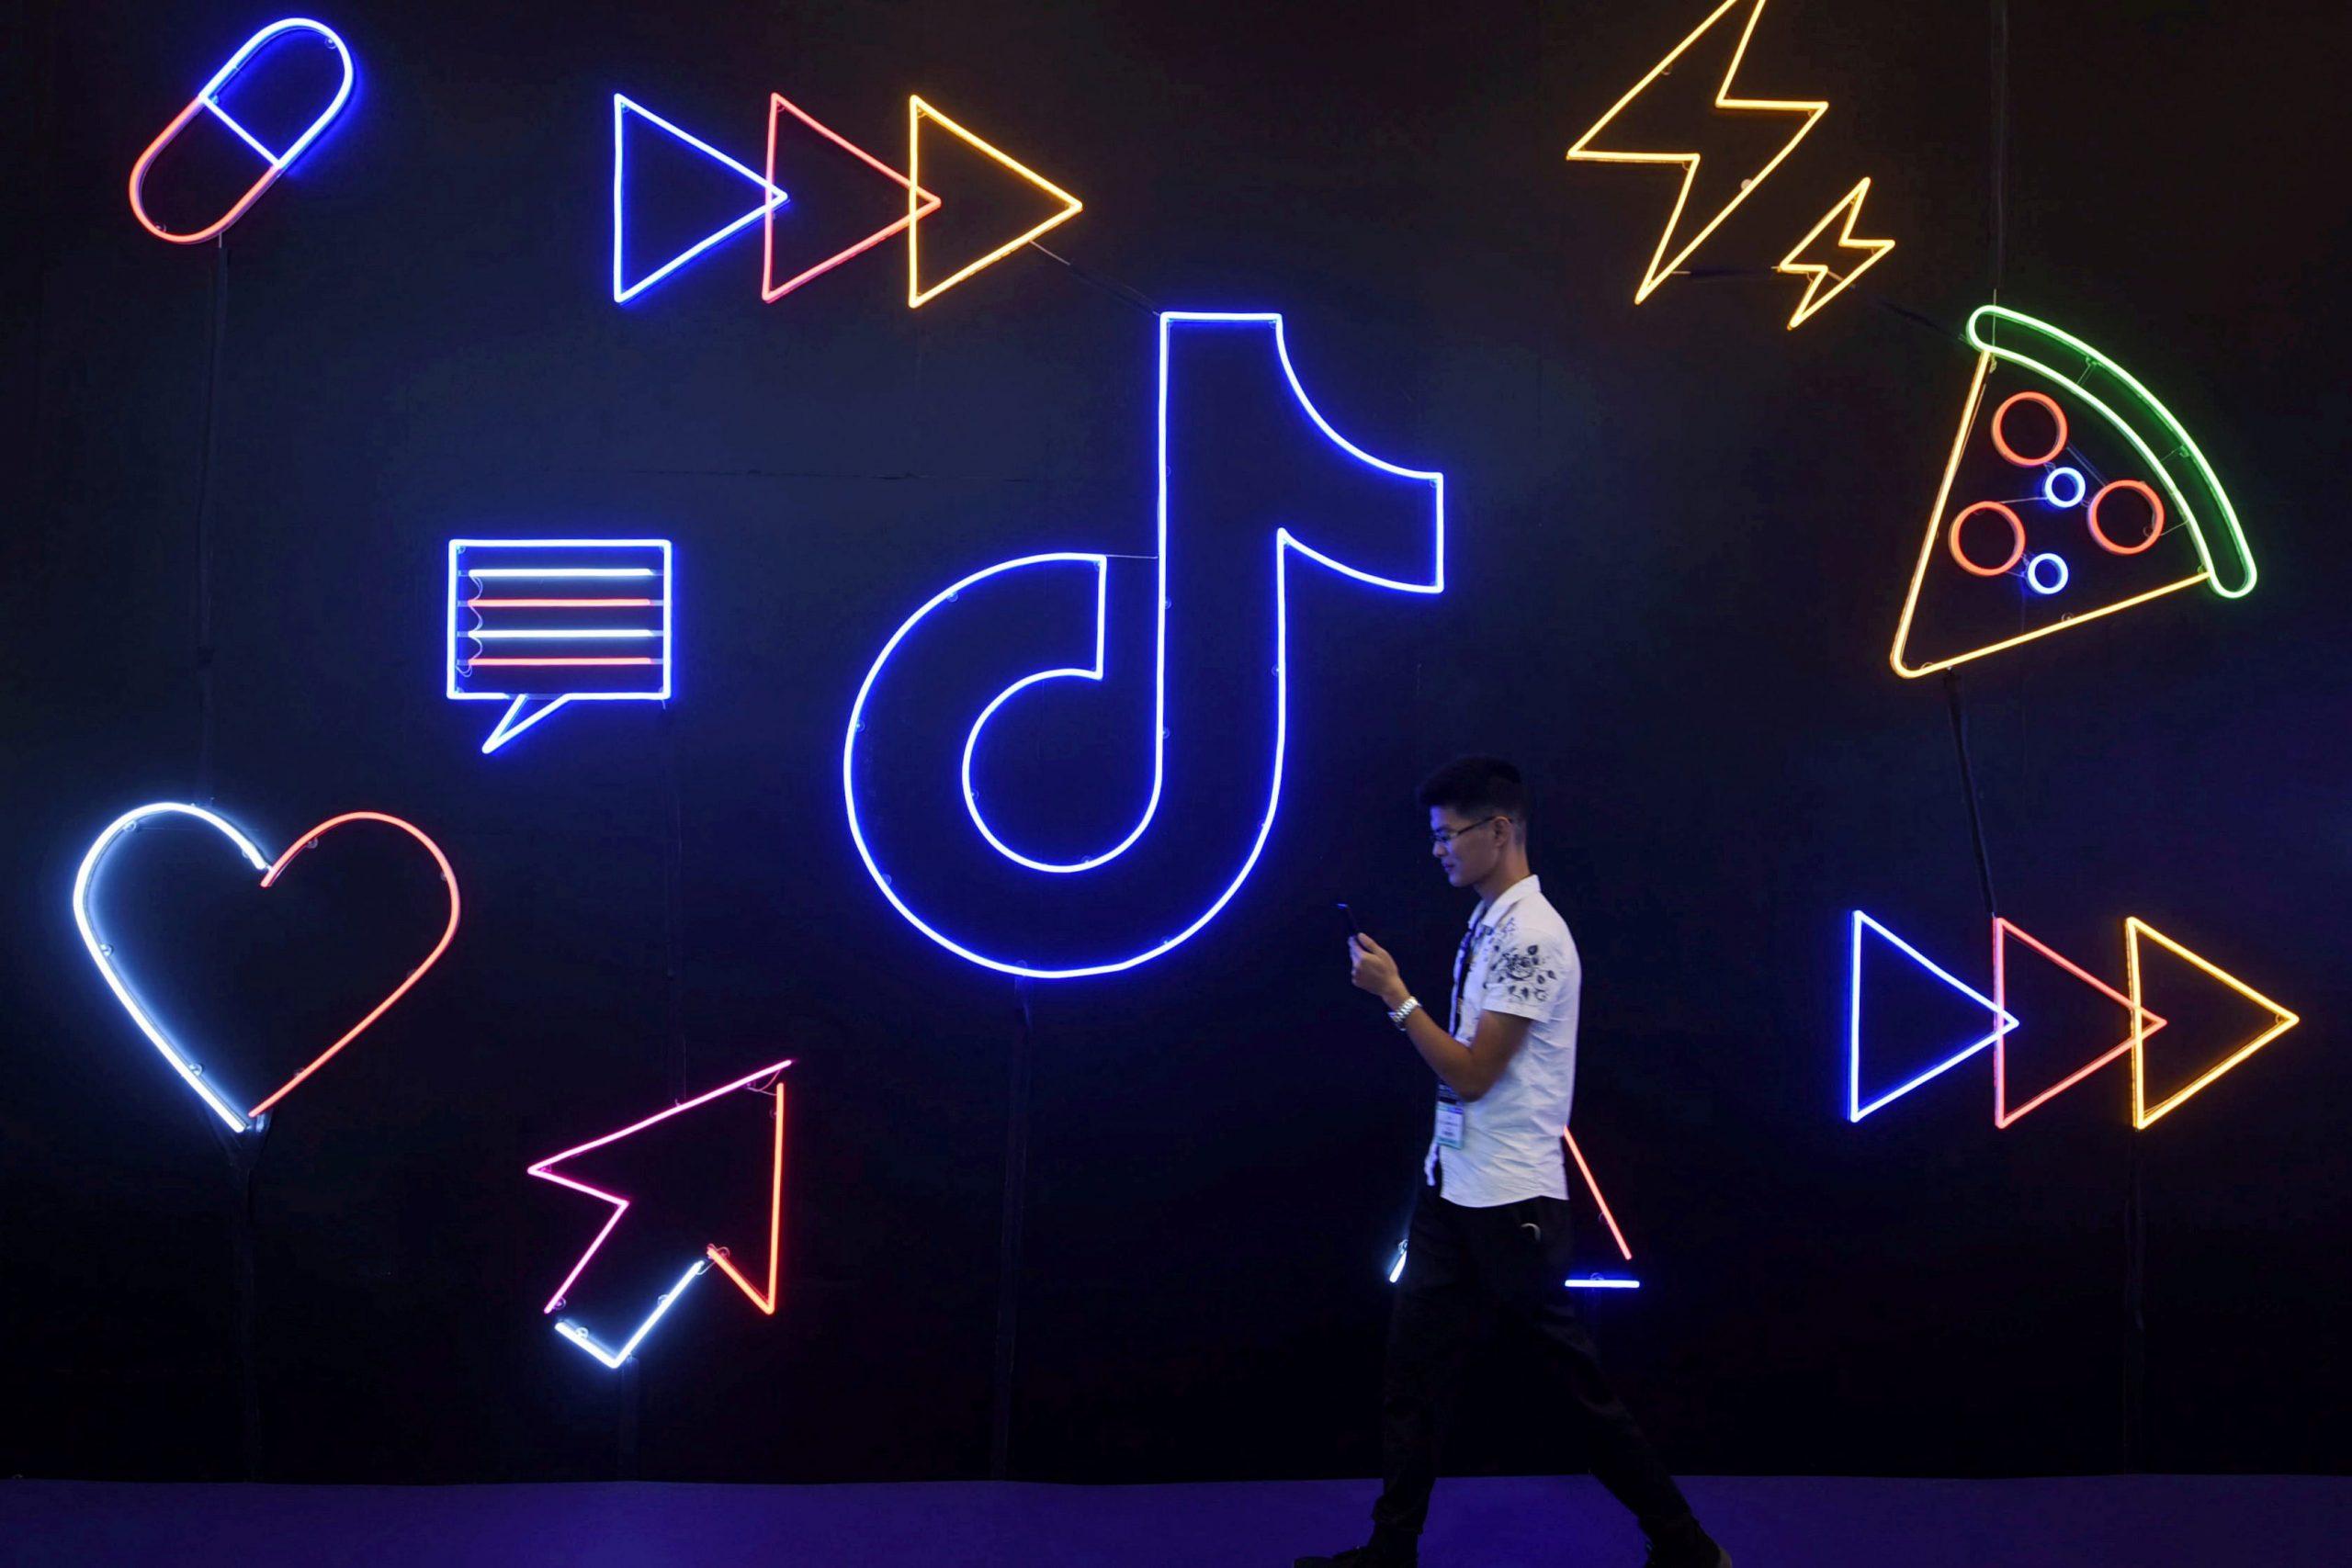 china-video-apps-kuaishou-douyin-become-e-commerce-sites-like-alibaba